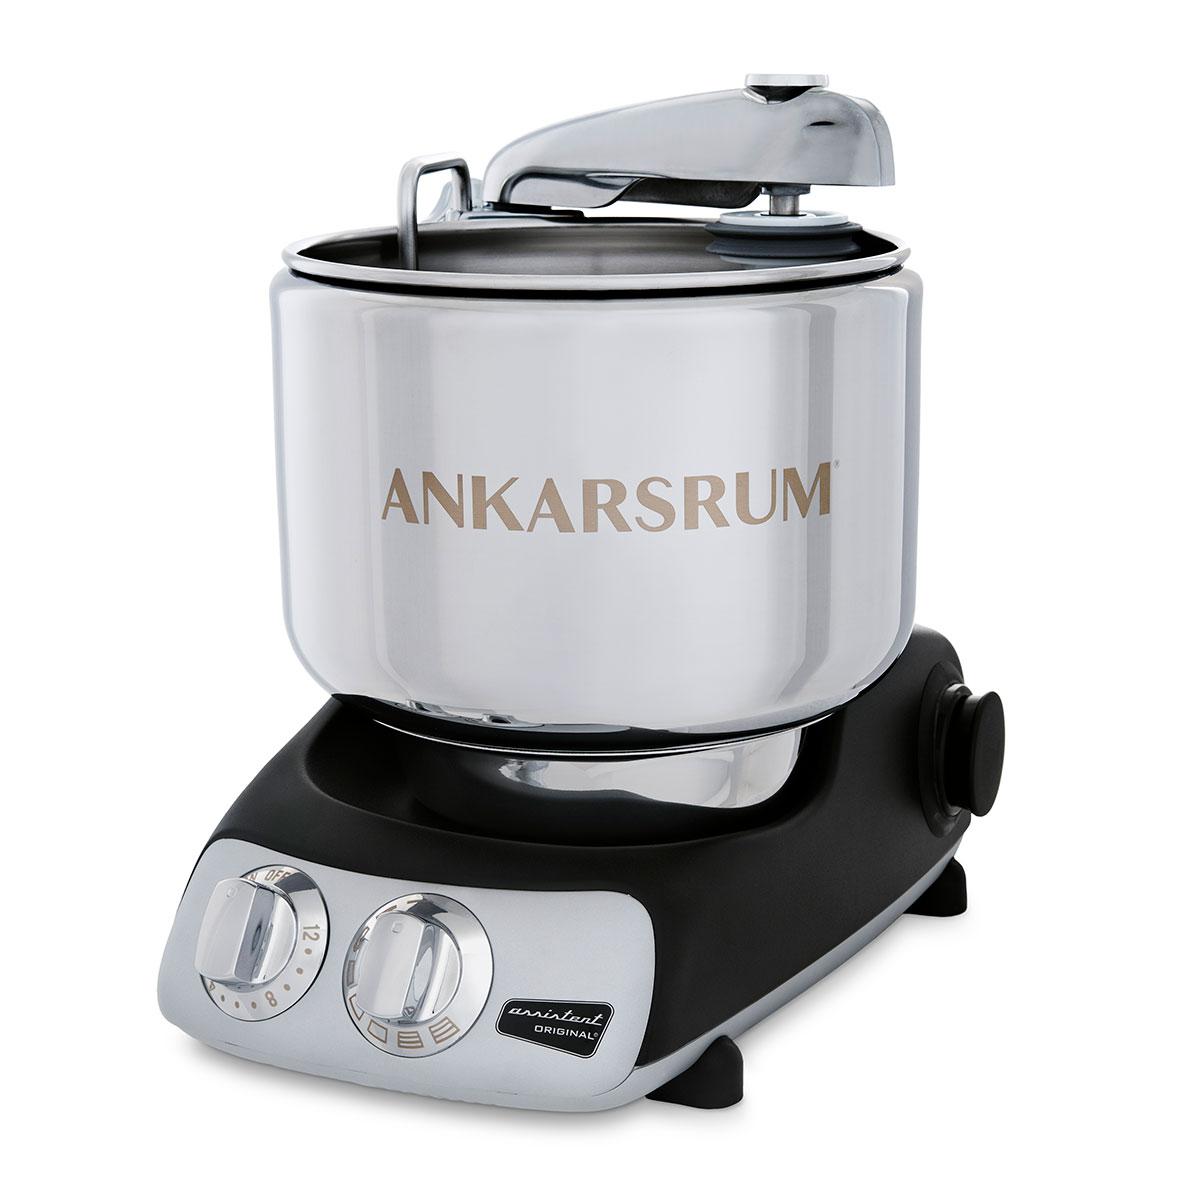 Ankarsrum køkkenmaskine - Assistent original 6230B - Matsort